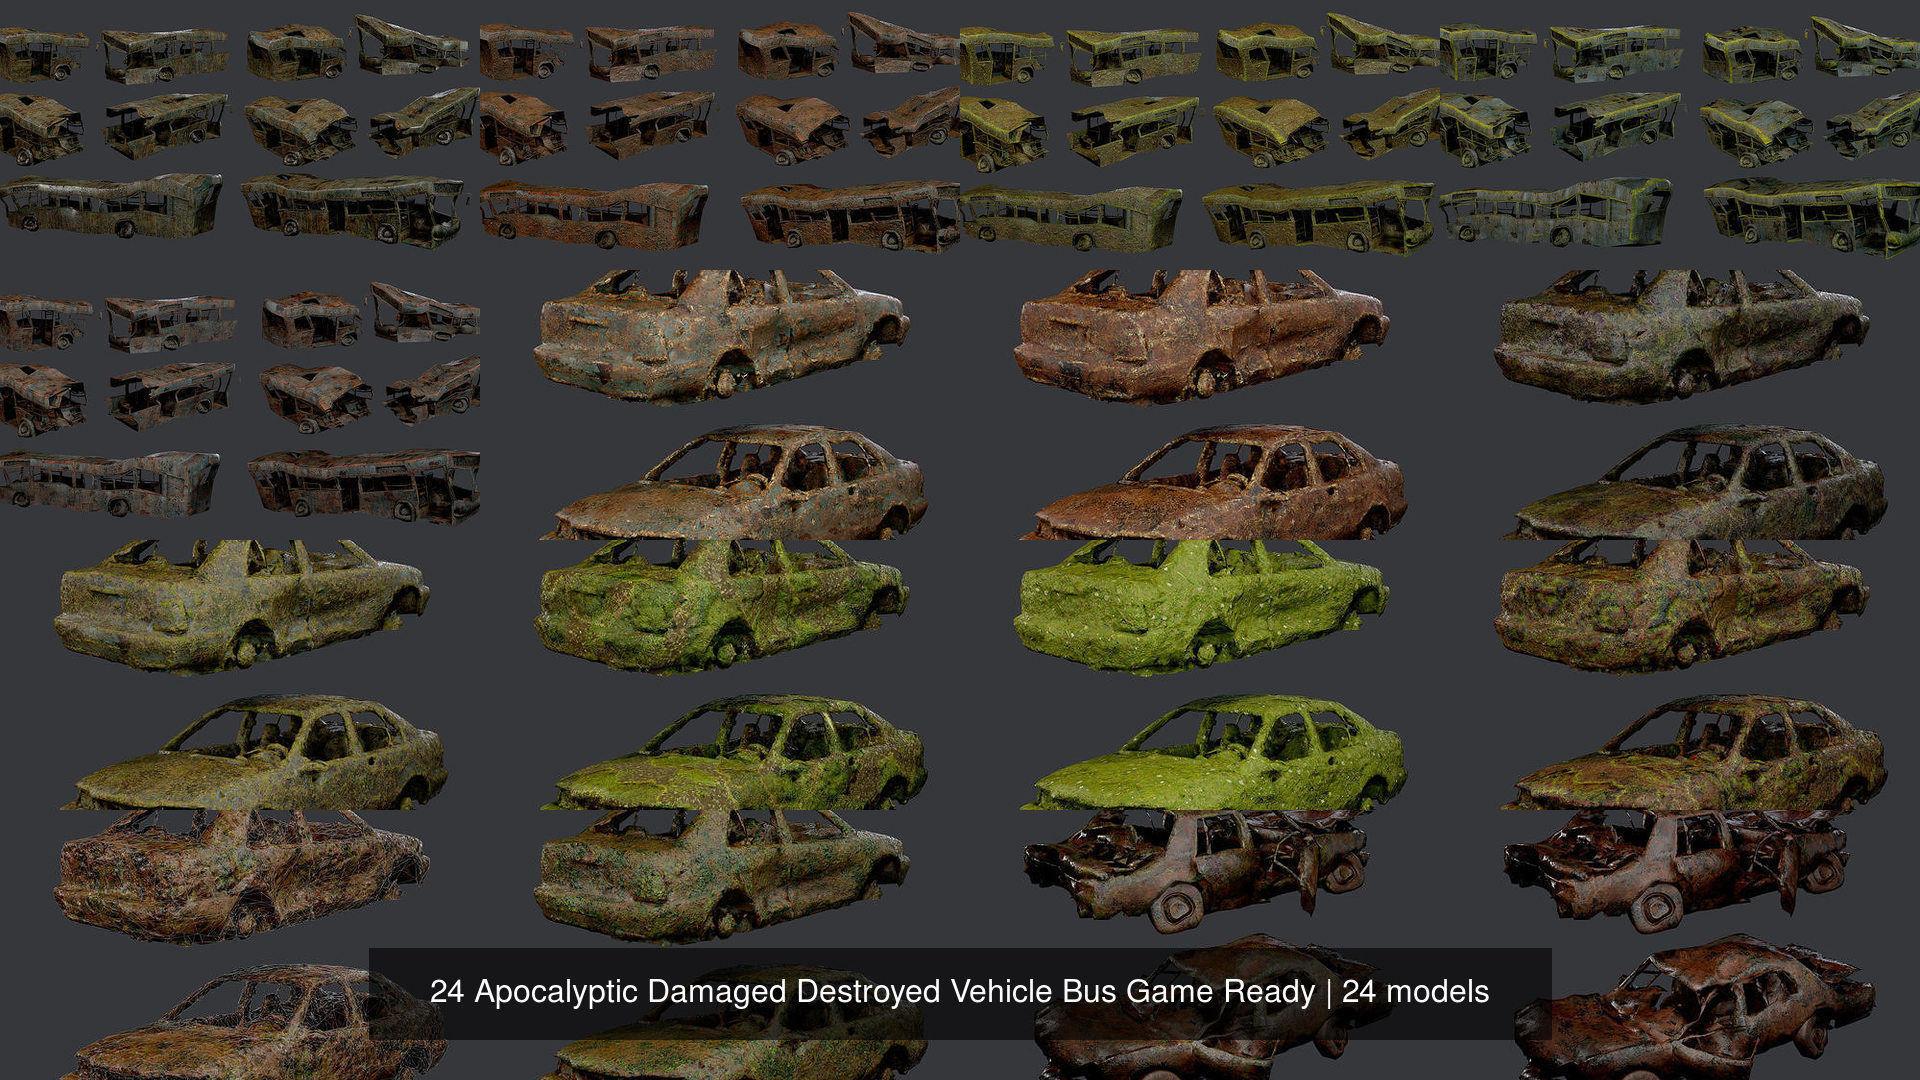 24 Apocalyptic Damaged Destroyed Vehicle Bus Game Ready